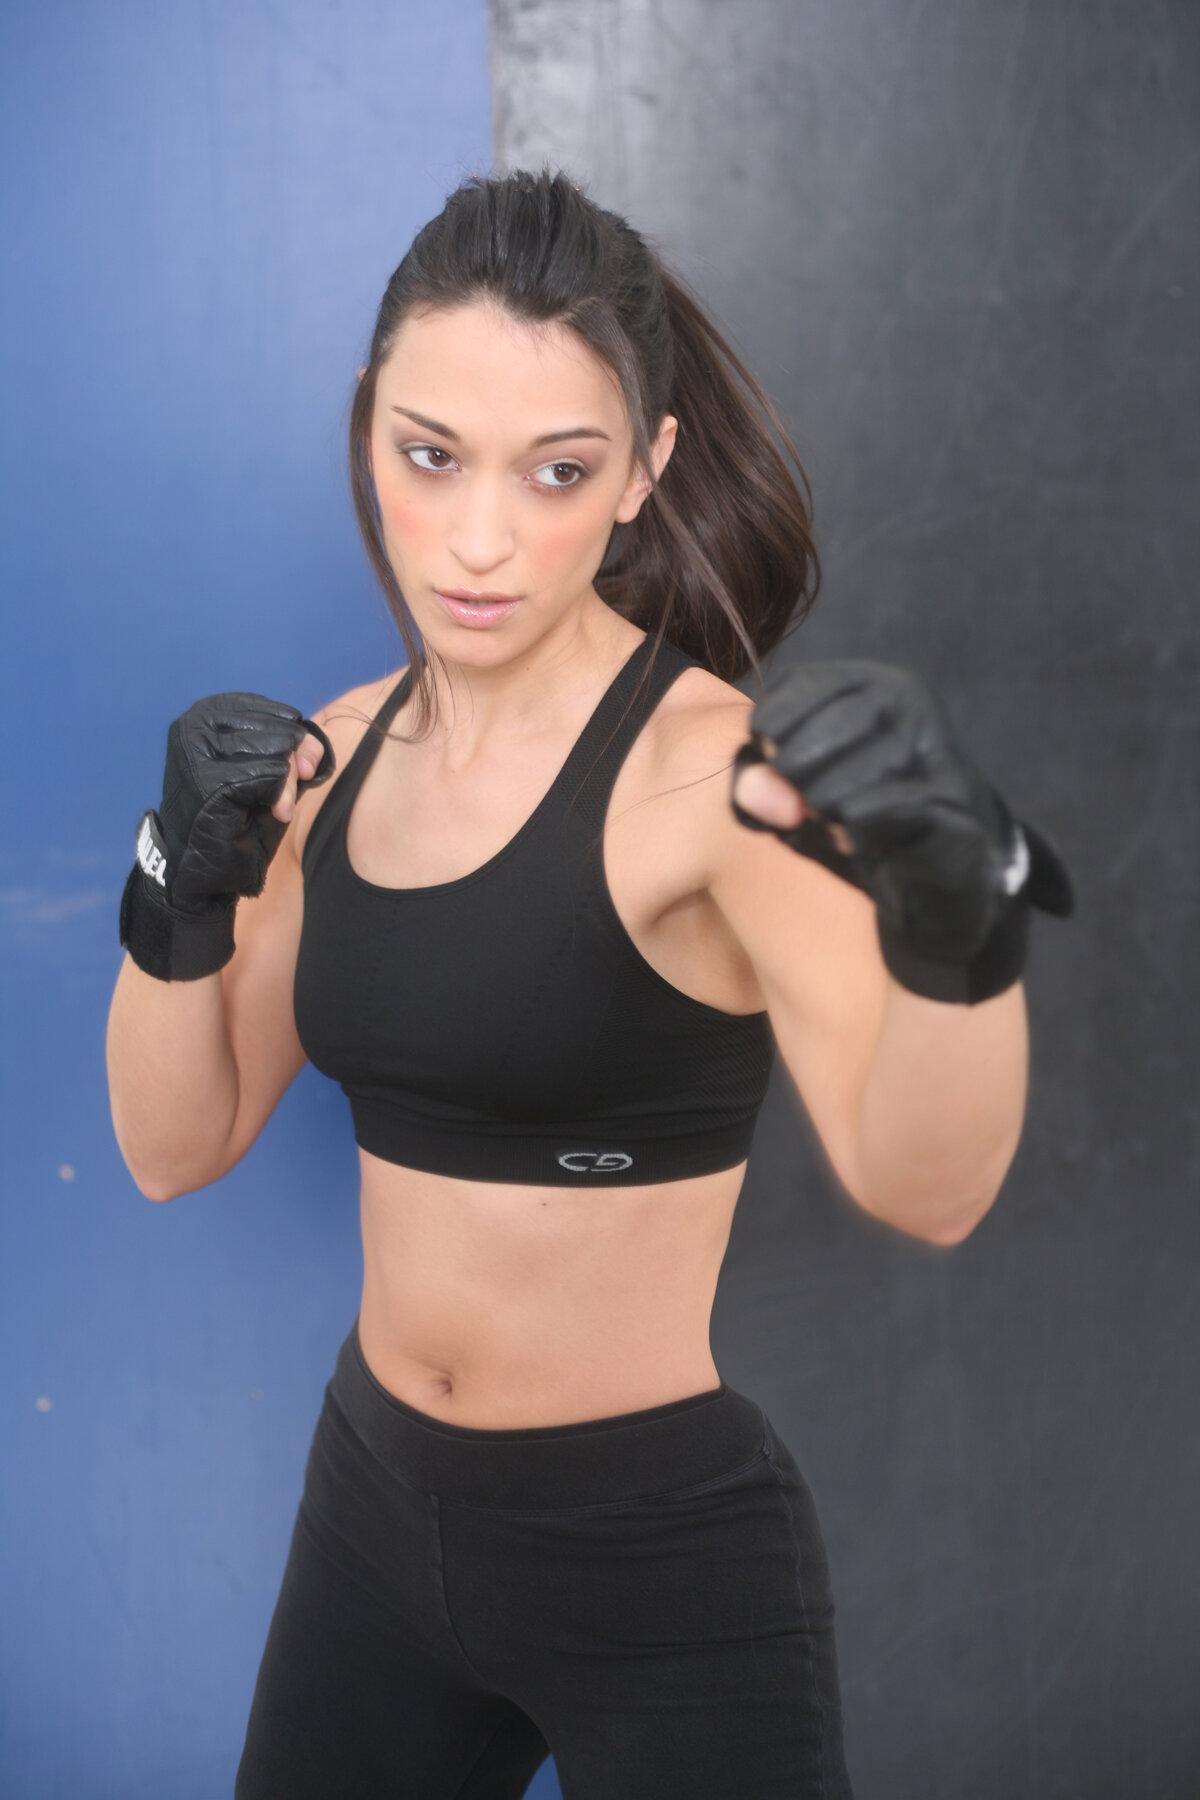 Sarah Tomko